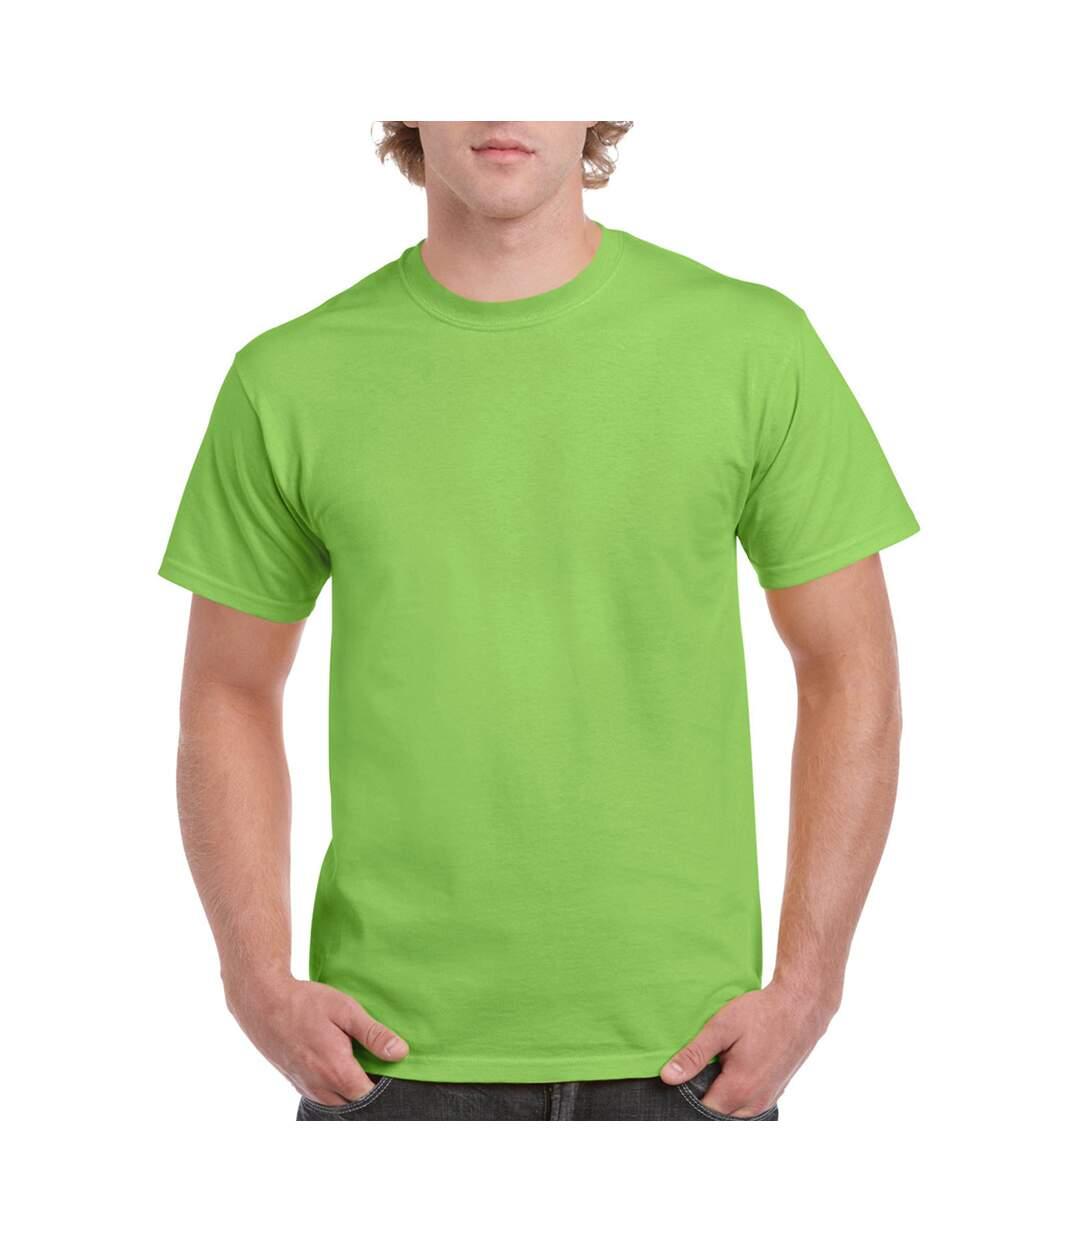 Gildan Mens Ultra Cotton Short Sleeve T-Shirt (Lime) - UTBC475